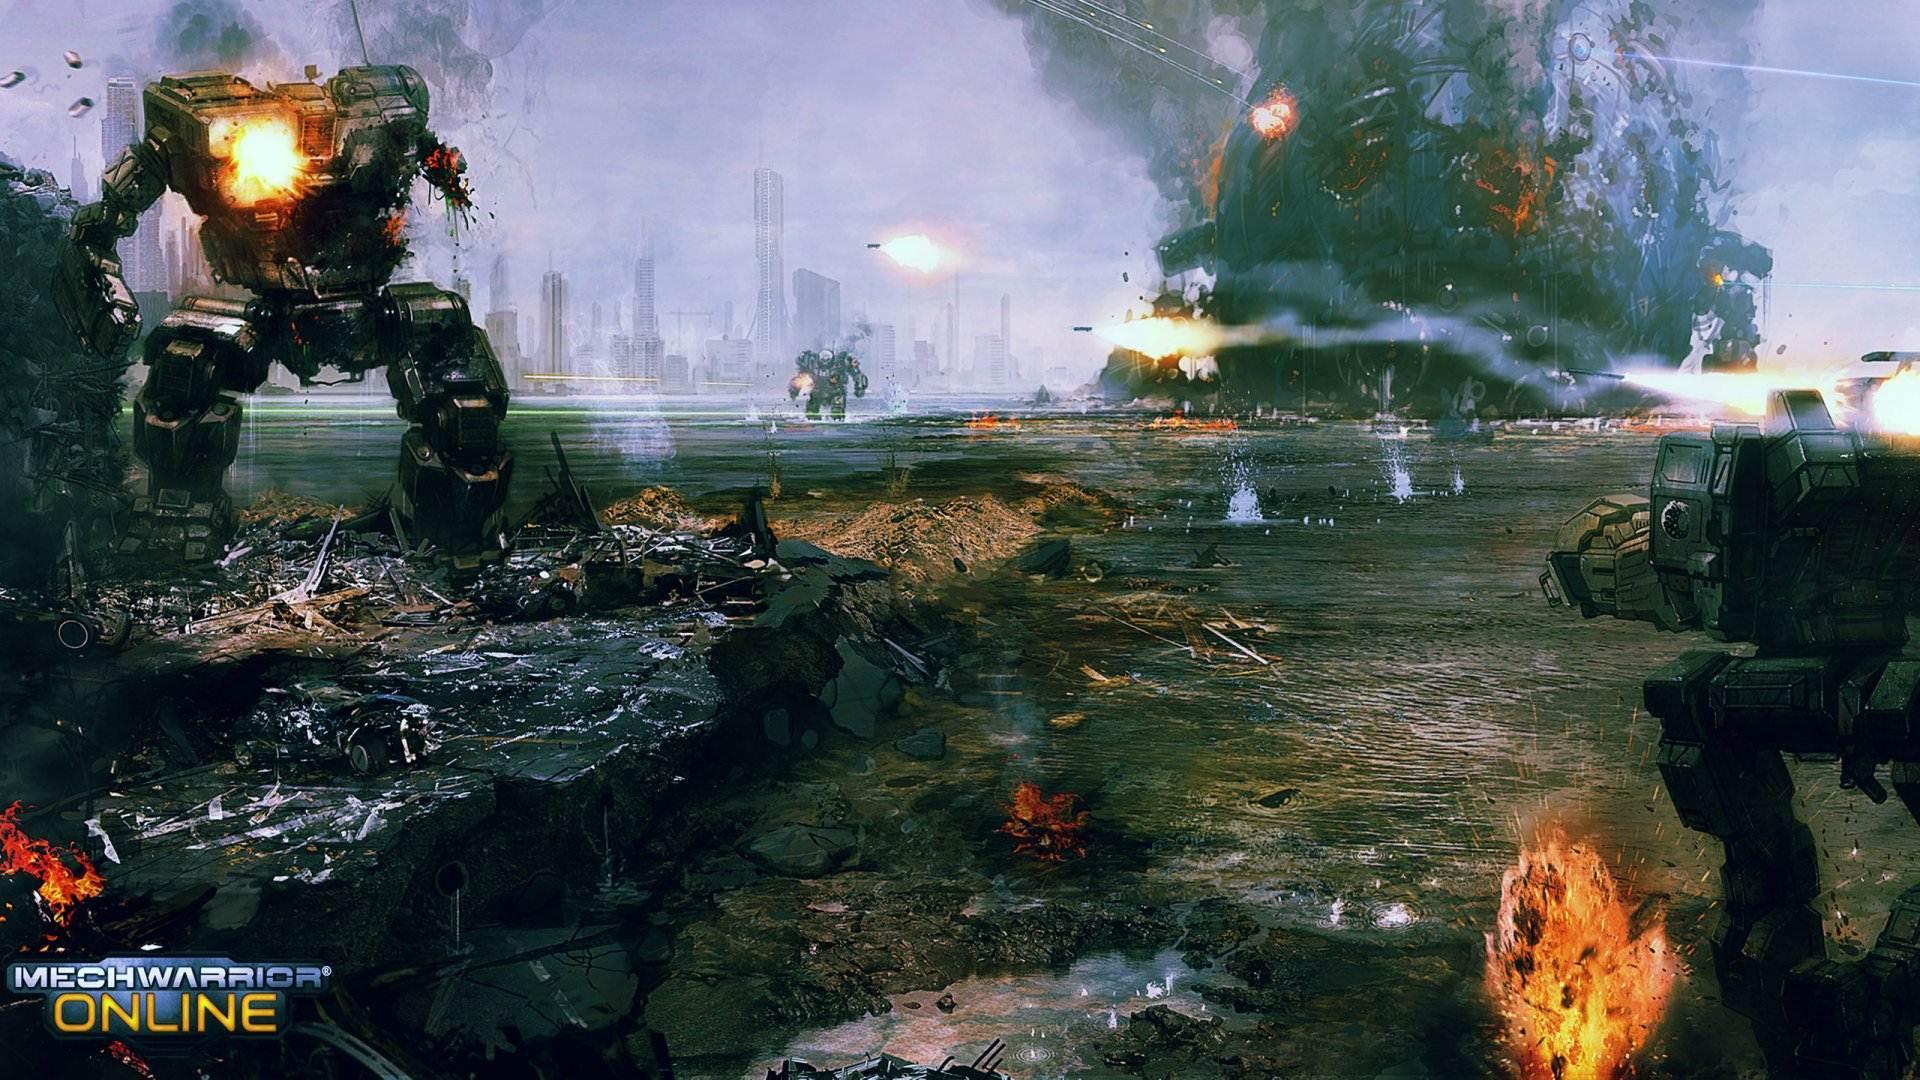 mechwarrior online wallpaper in hd